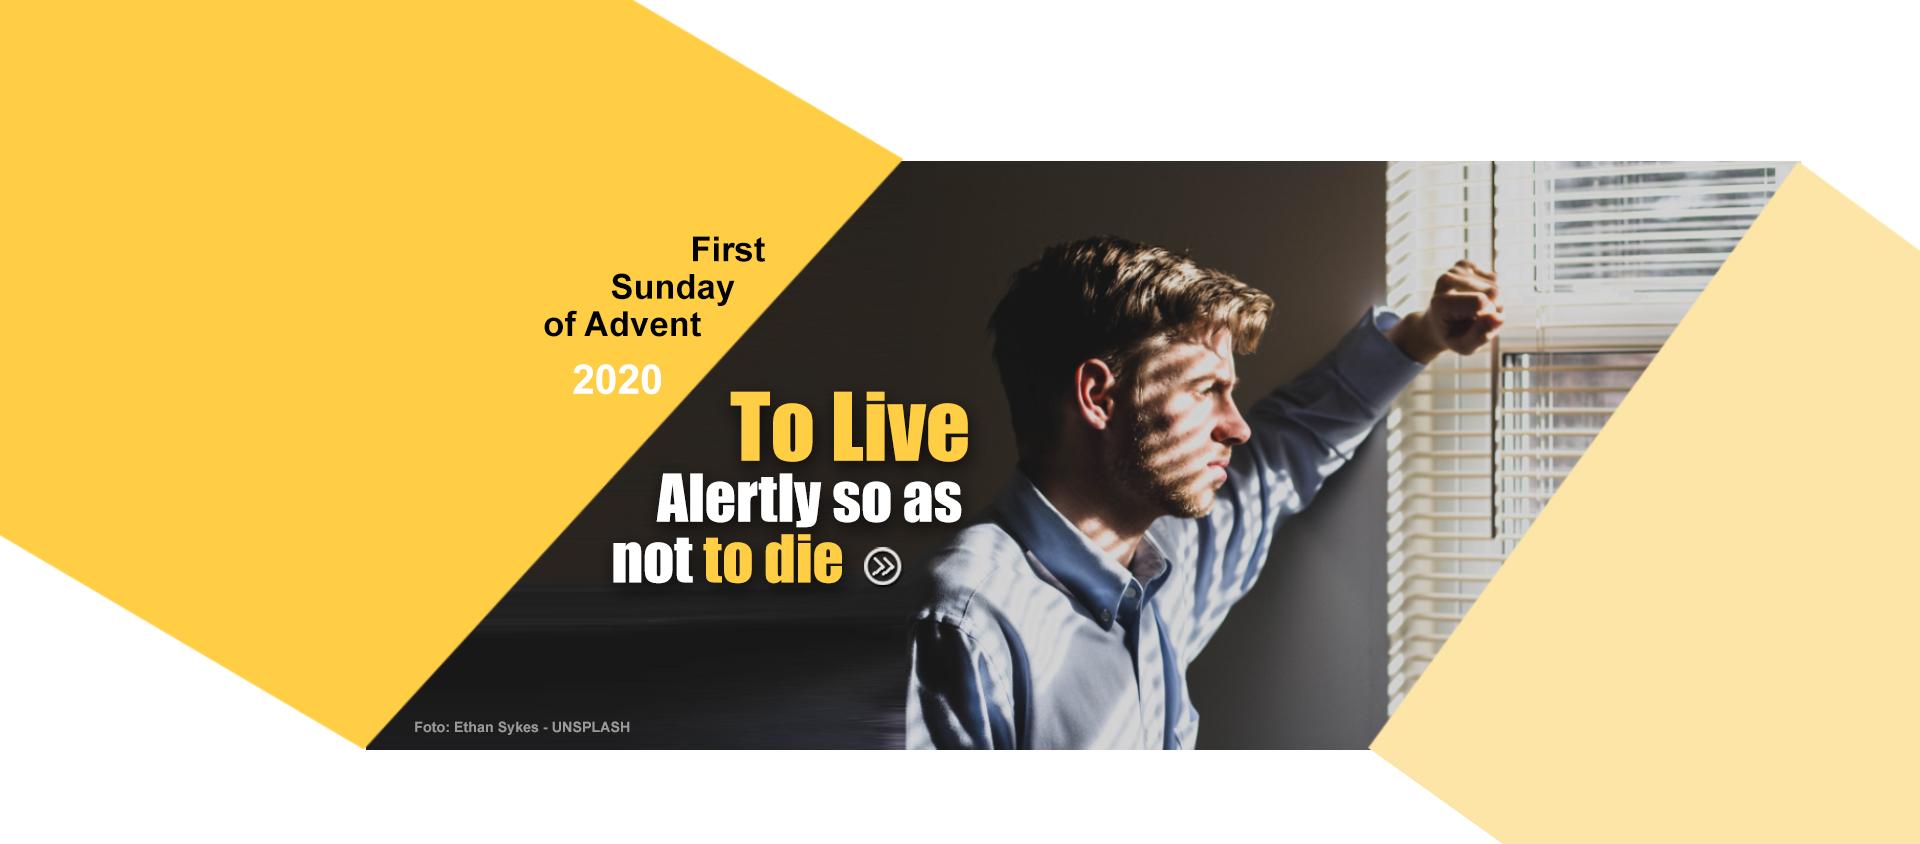 1st Sunday of Advent 2020